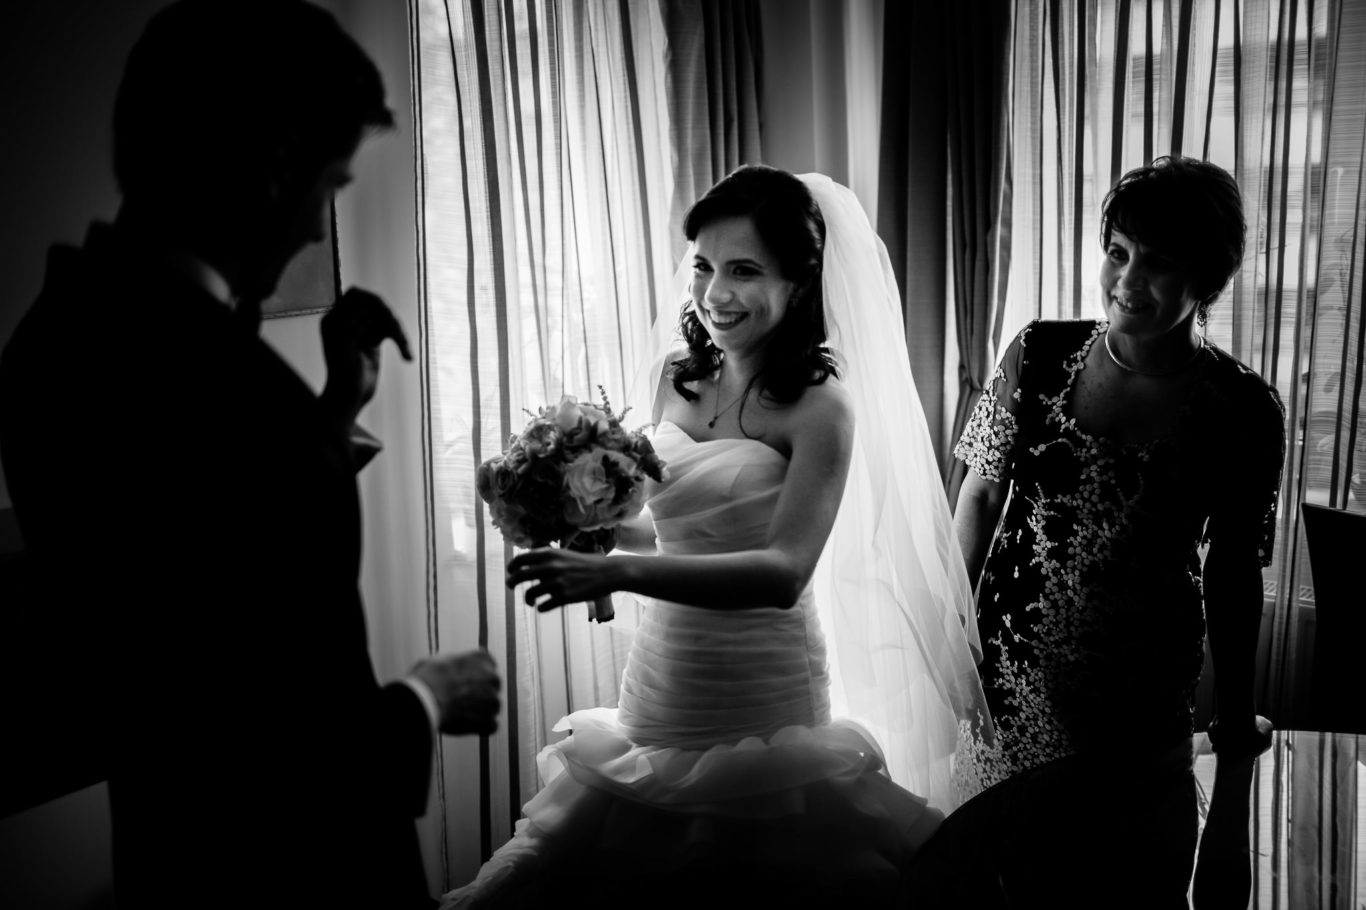 0312-Fotografie-nunta-Simona-Valentin-fotograf-Ciprian-Dumitrescu-CDF_8828